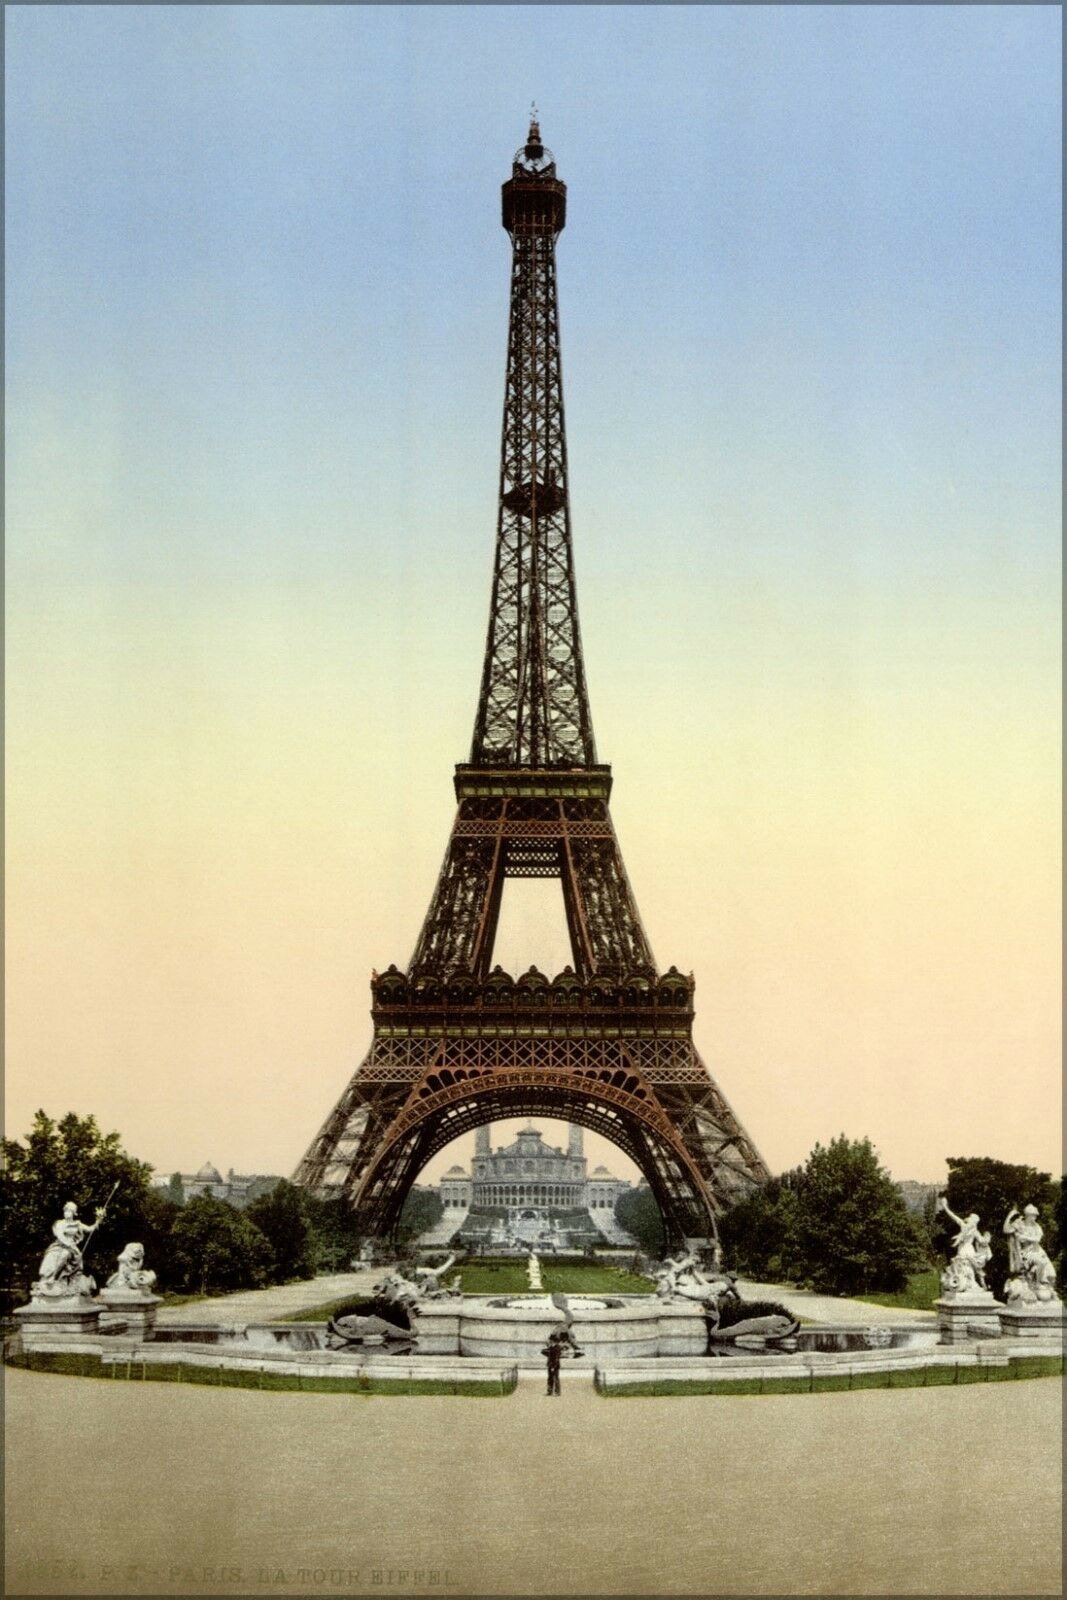 Eiffel Tower at Dusk Poster Beauty Lights France Paris Blue sky Staple Piece